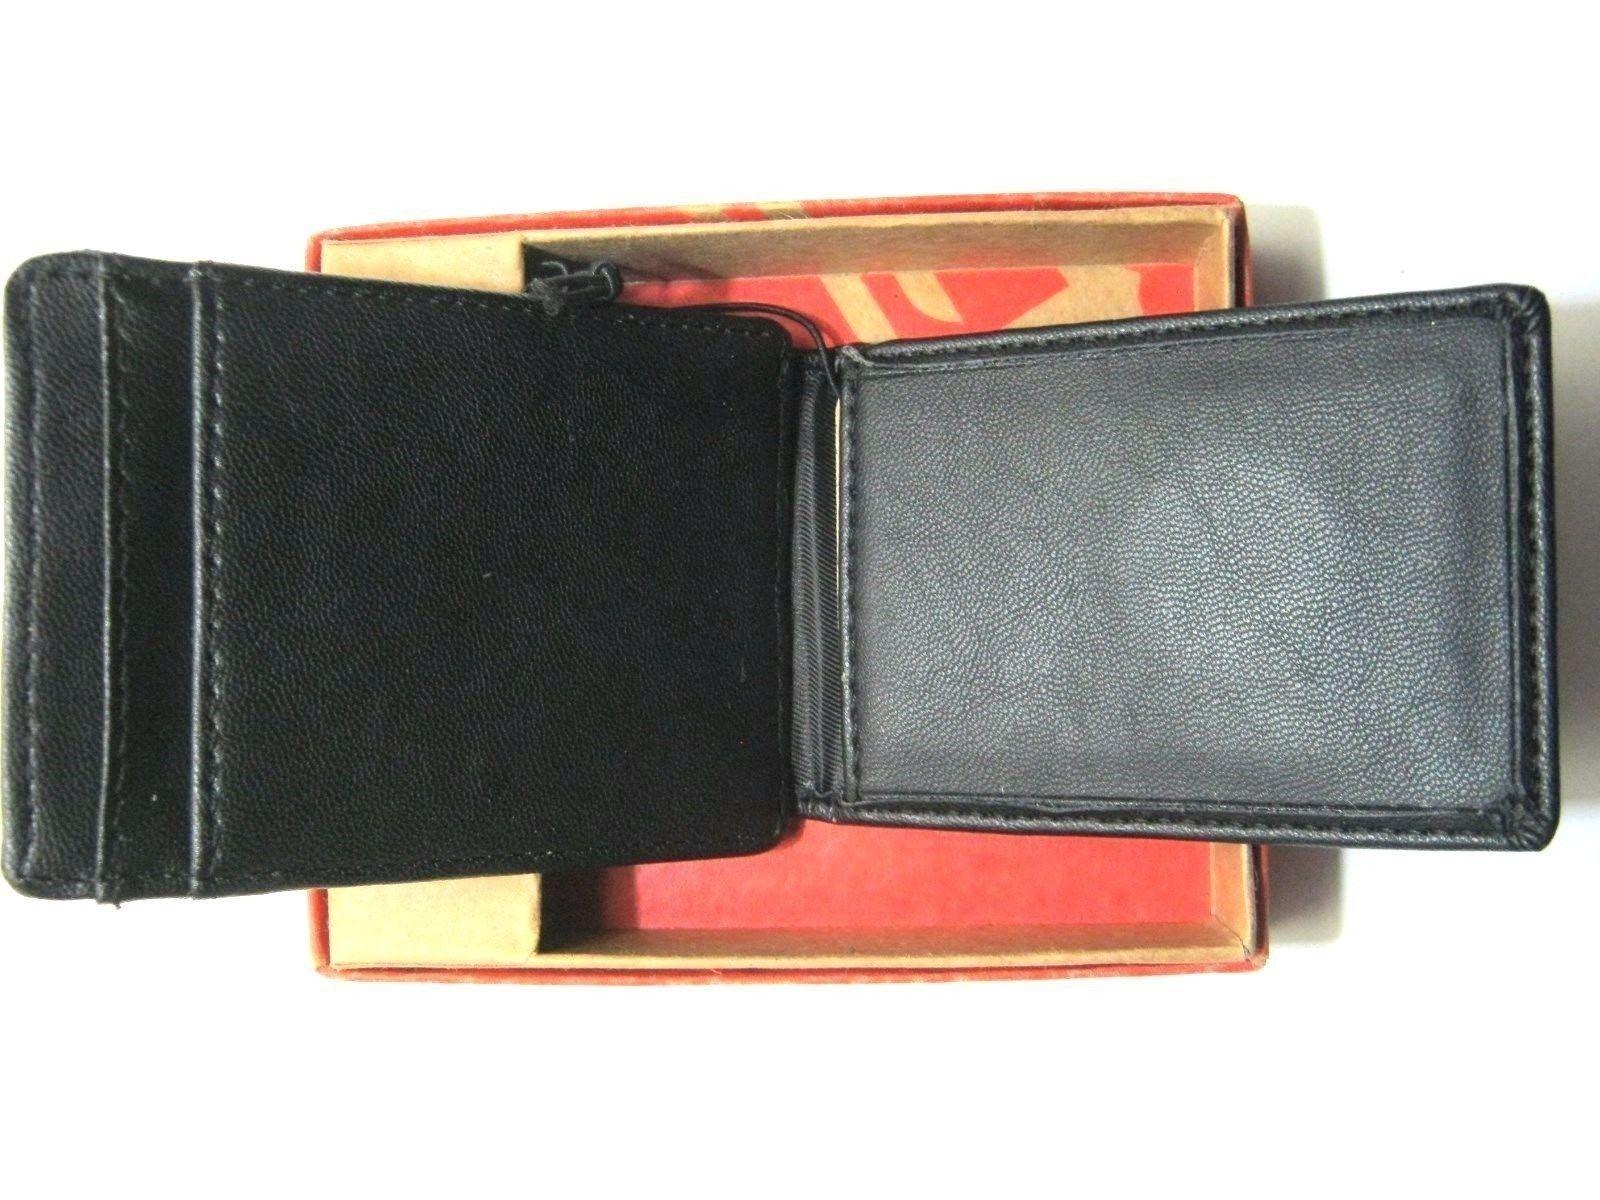 DOCKERS Leather Money Clip Wallet